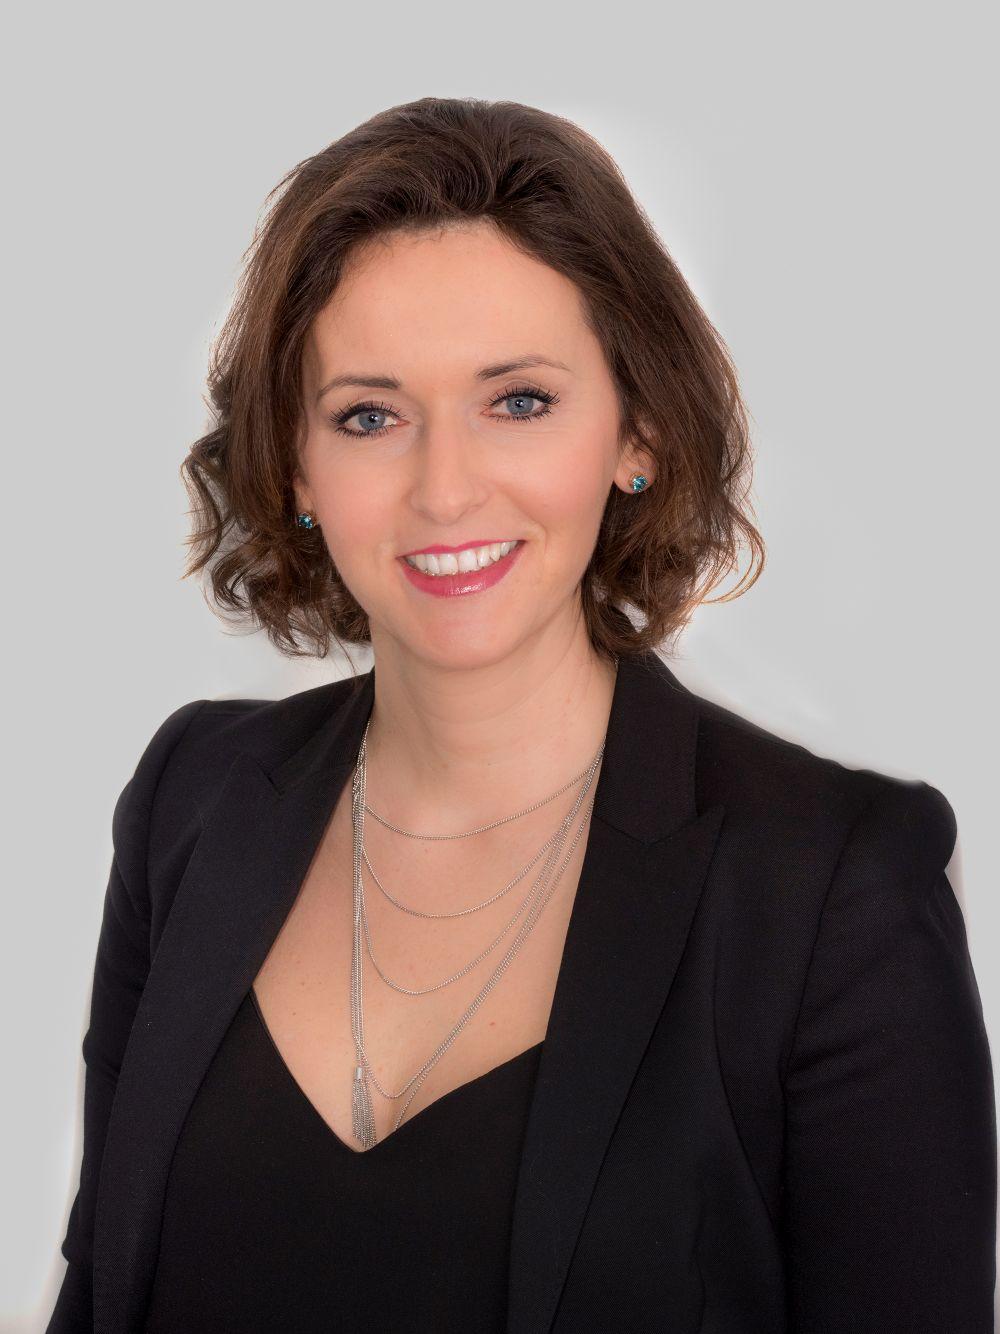 Elżbieta Dönmez